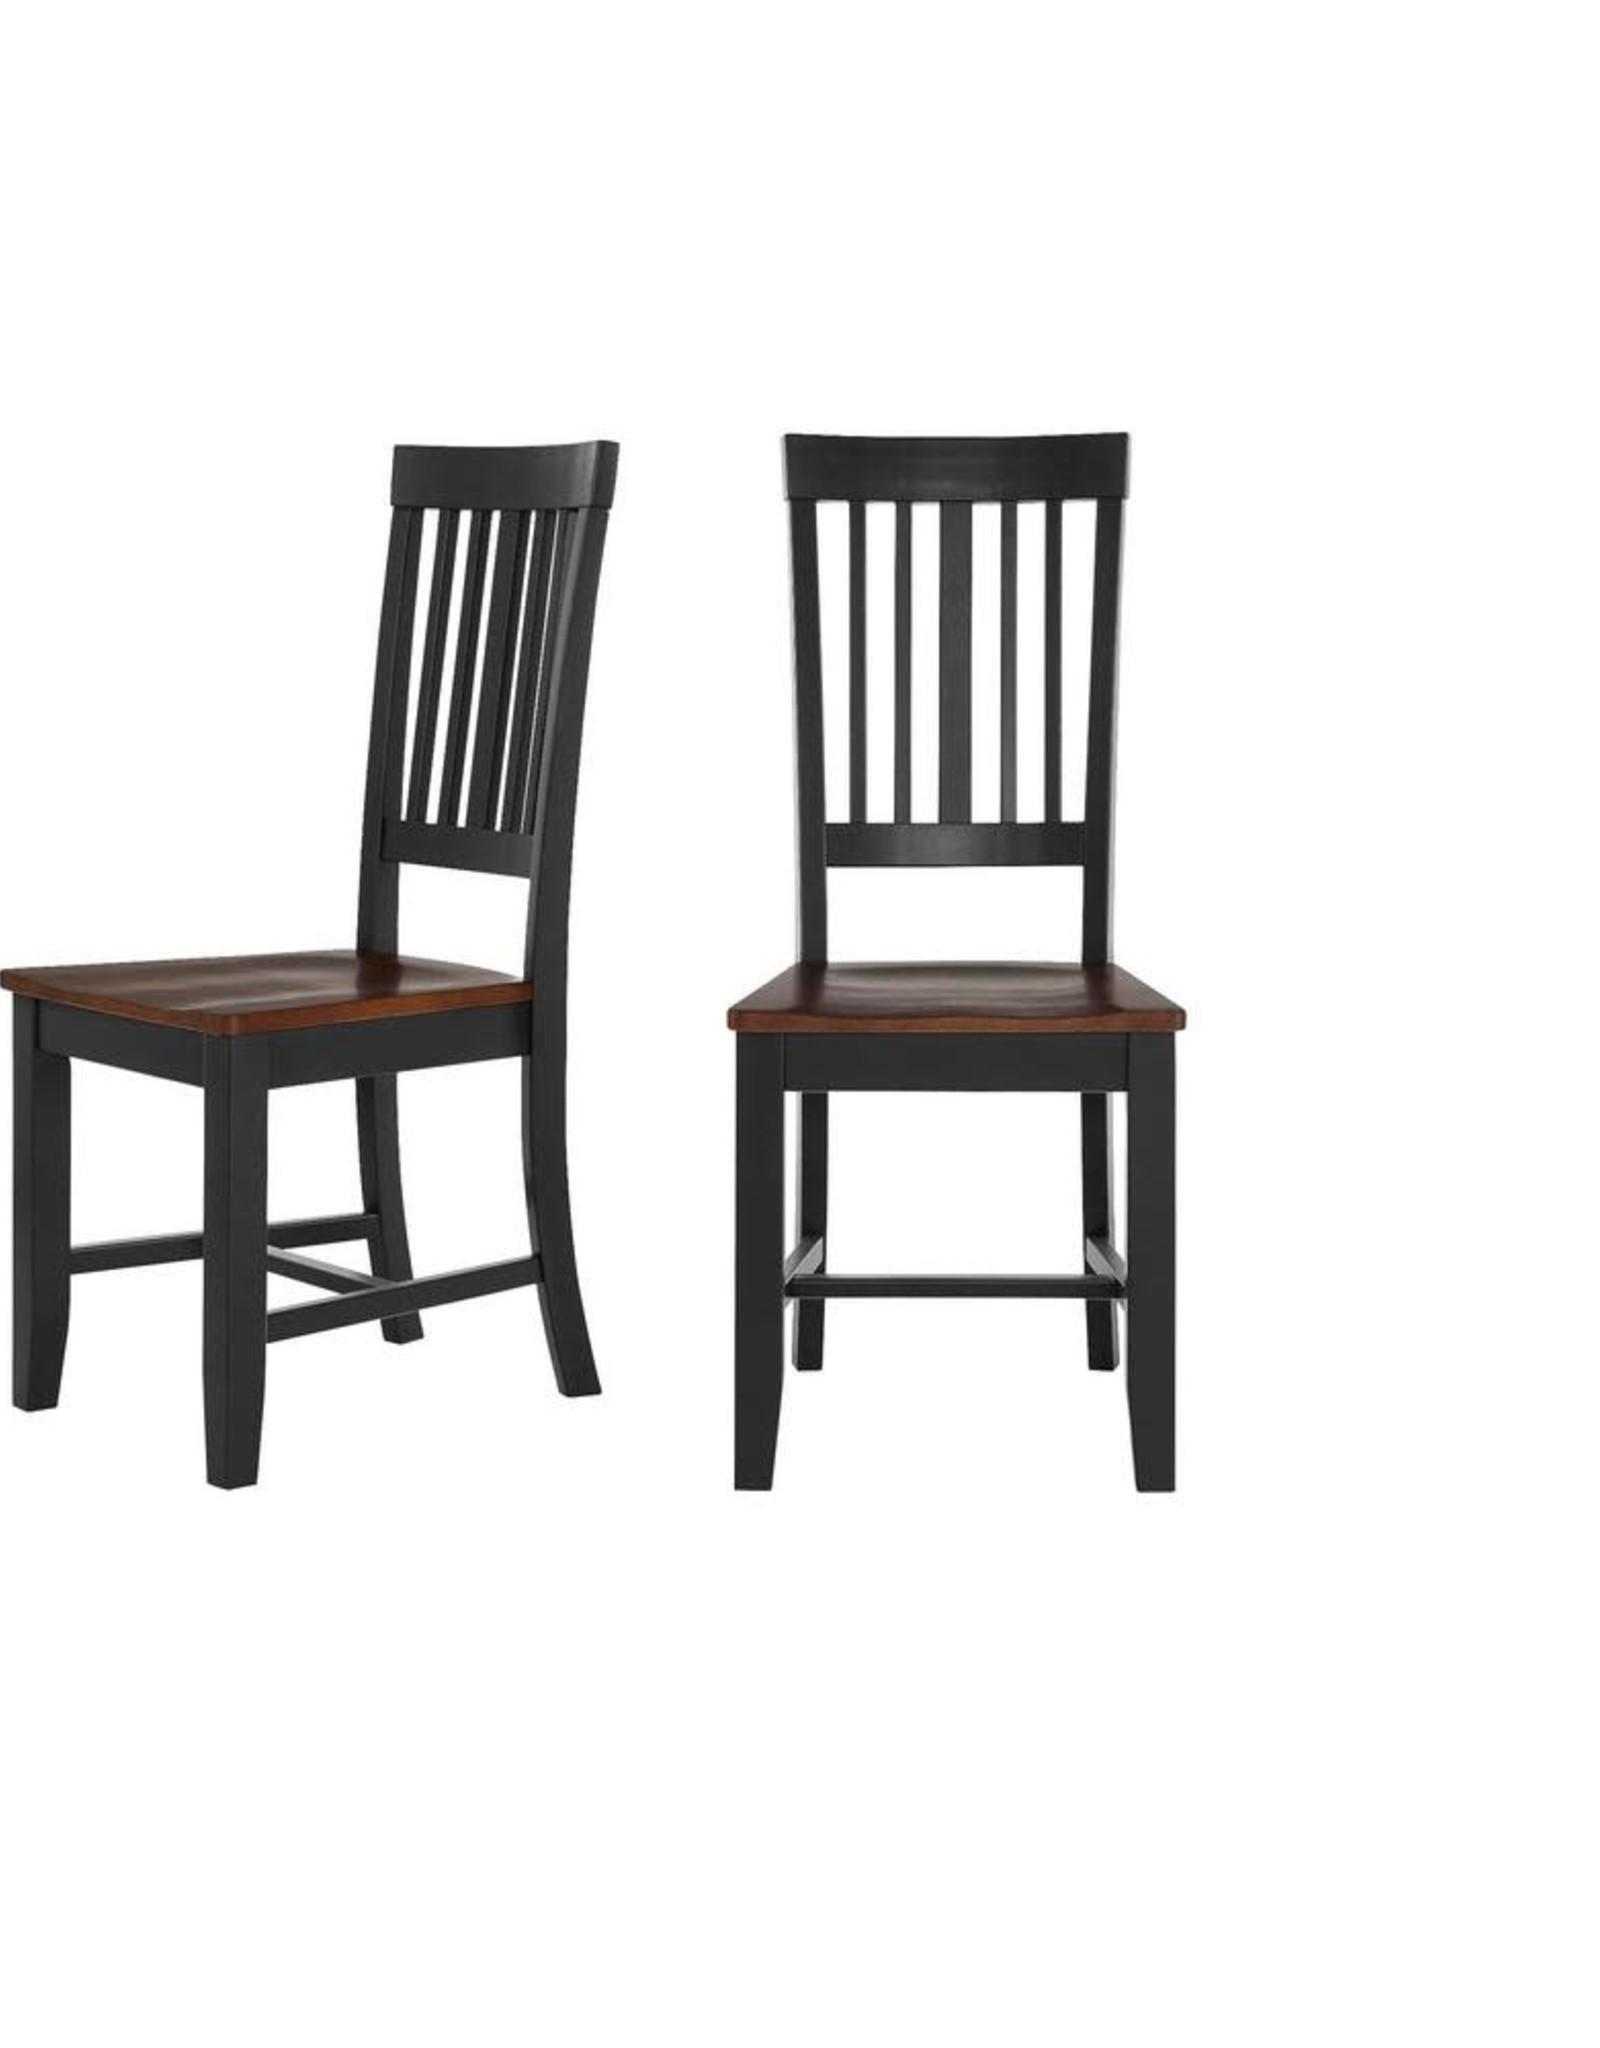 StyleWell Scottsbury Black Wood Dining Chair with Slat Back and Walnut Finish Seat (Set of 2)